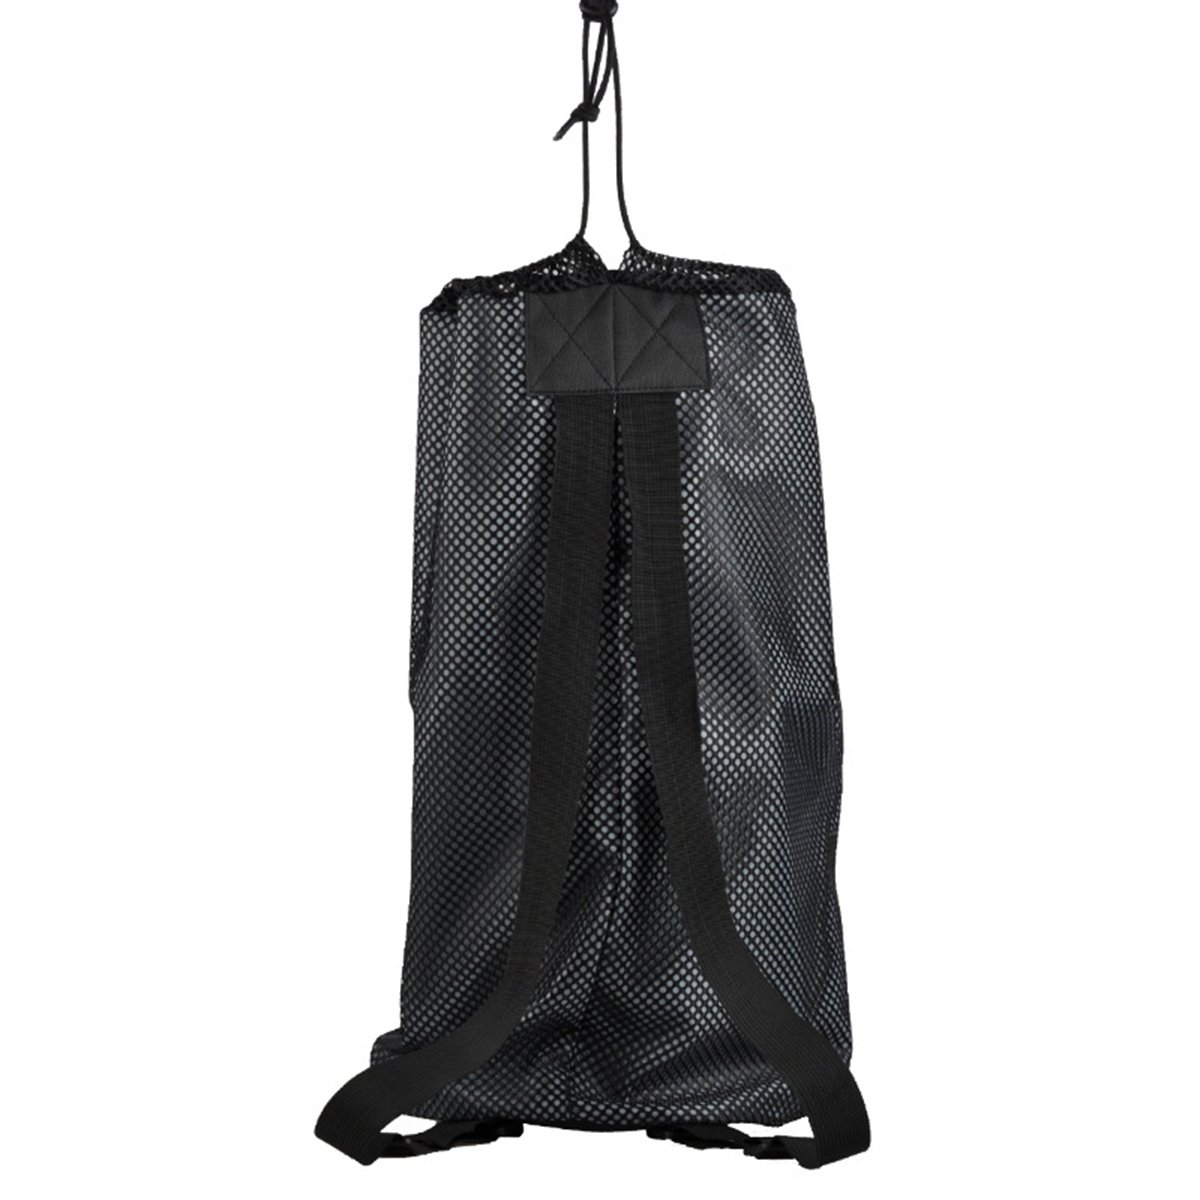 WINOMOスポーツボールバッグ巾着メッシュバックパックボールホルダーバッグのバスケットボールフットボールバレーボール(ブラック) B075XN34FY